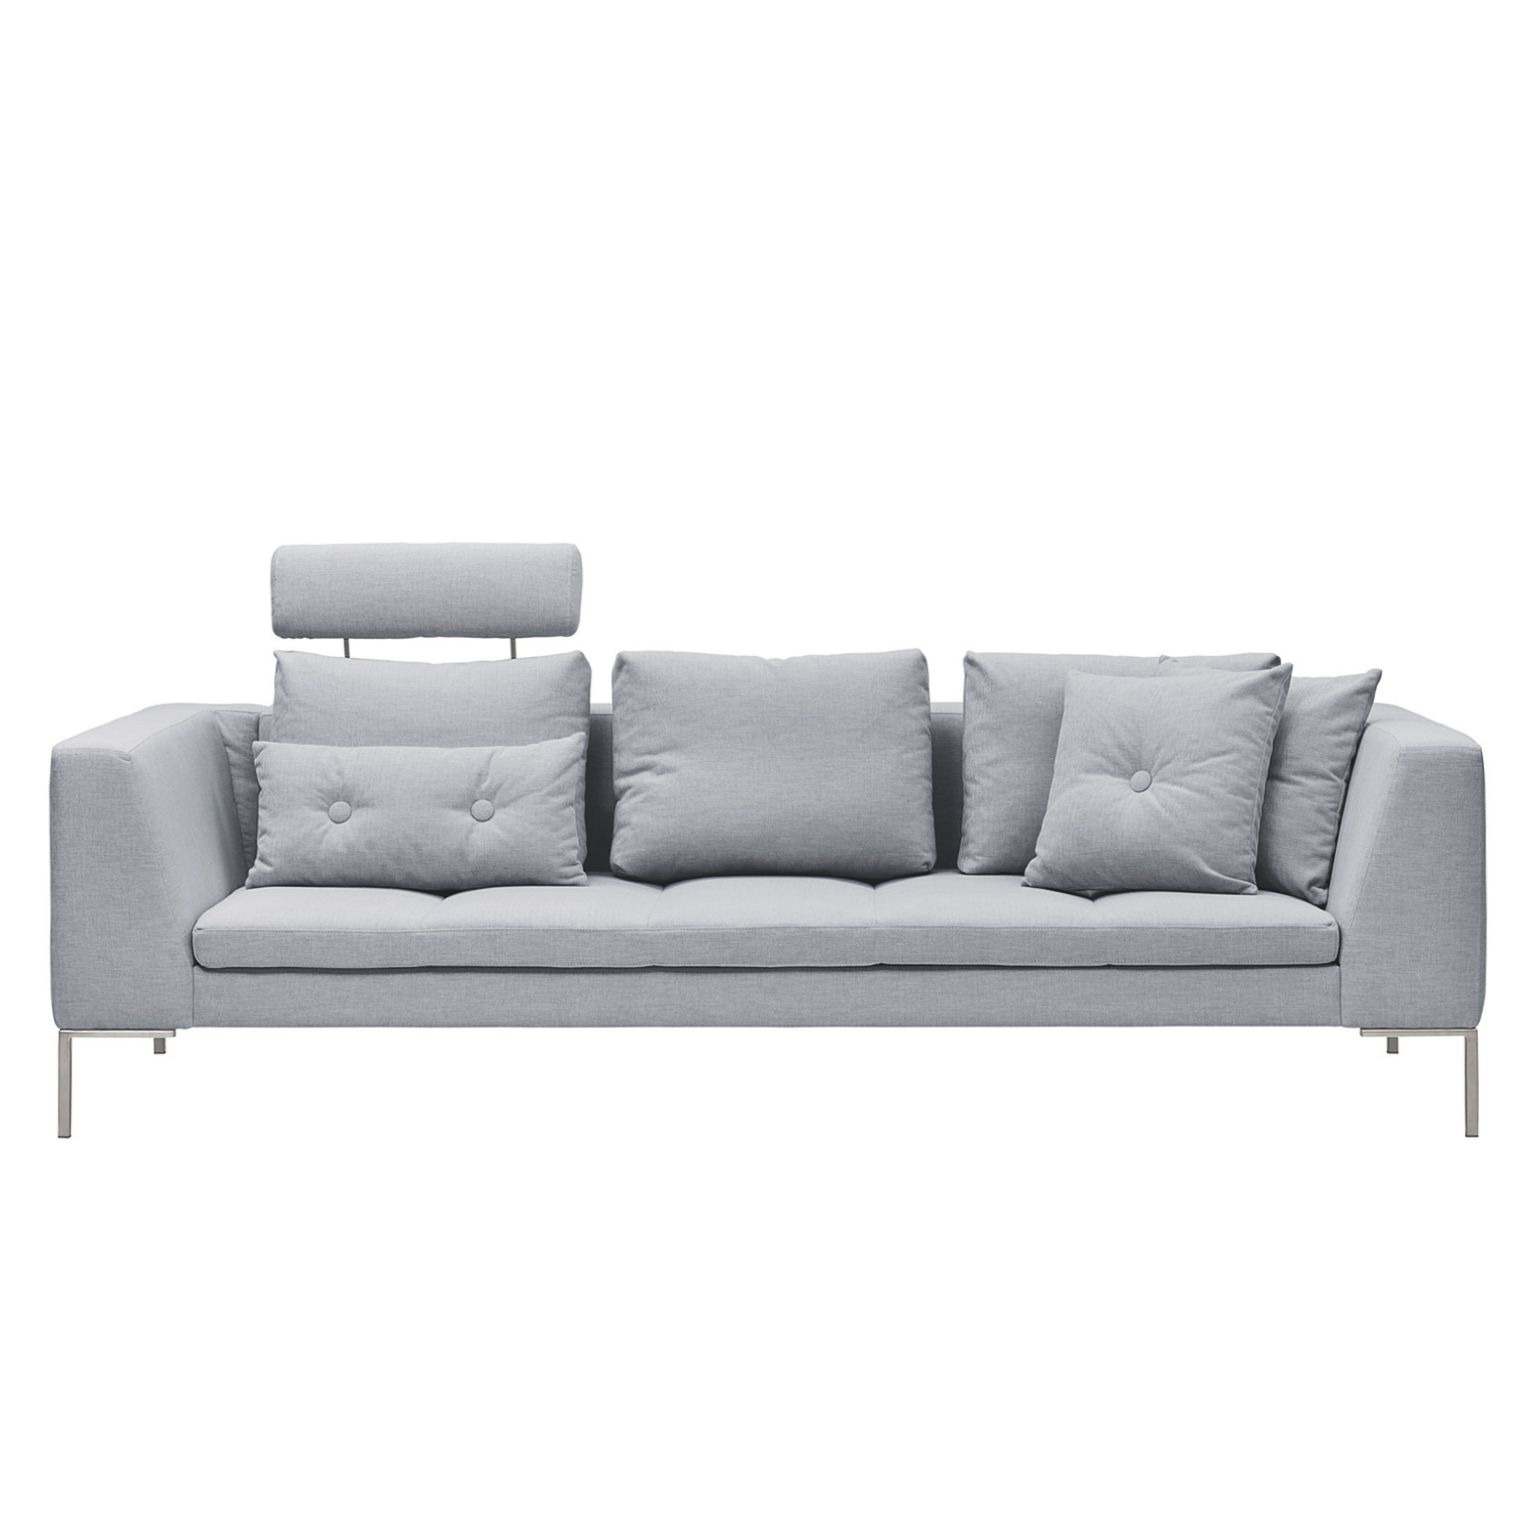 Sofa Madison 3 Sitzer Webstoff 3er Sofa Sofa Mit Relaxfunktion Und Sofa